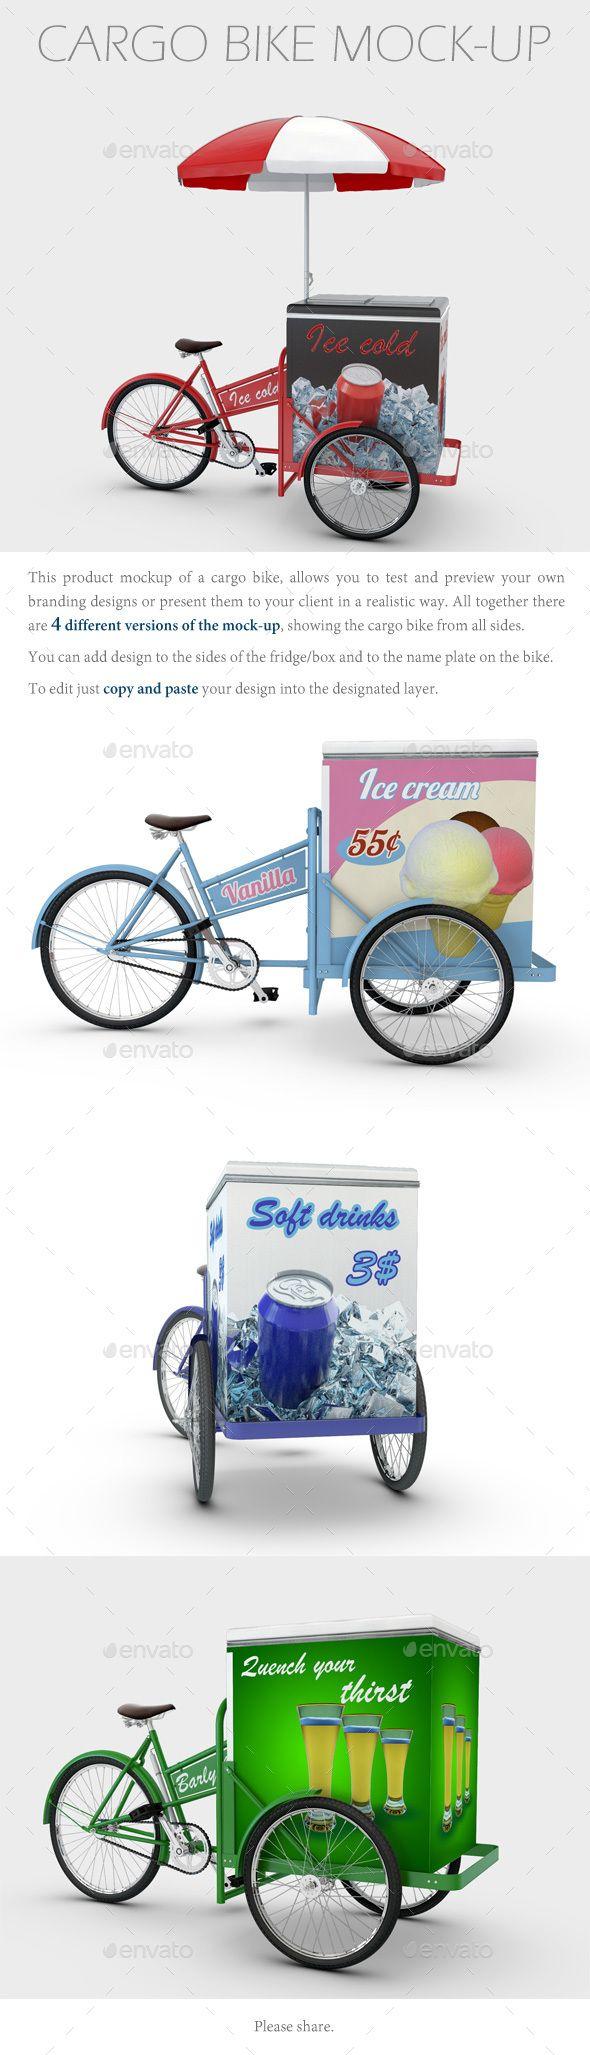 Download Cargo Bike Mock Up Cargo Bike Mockup Bike Cart